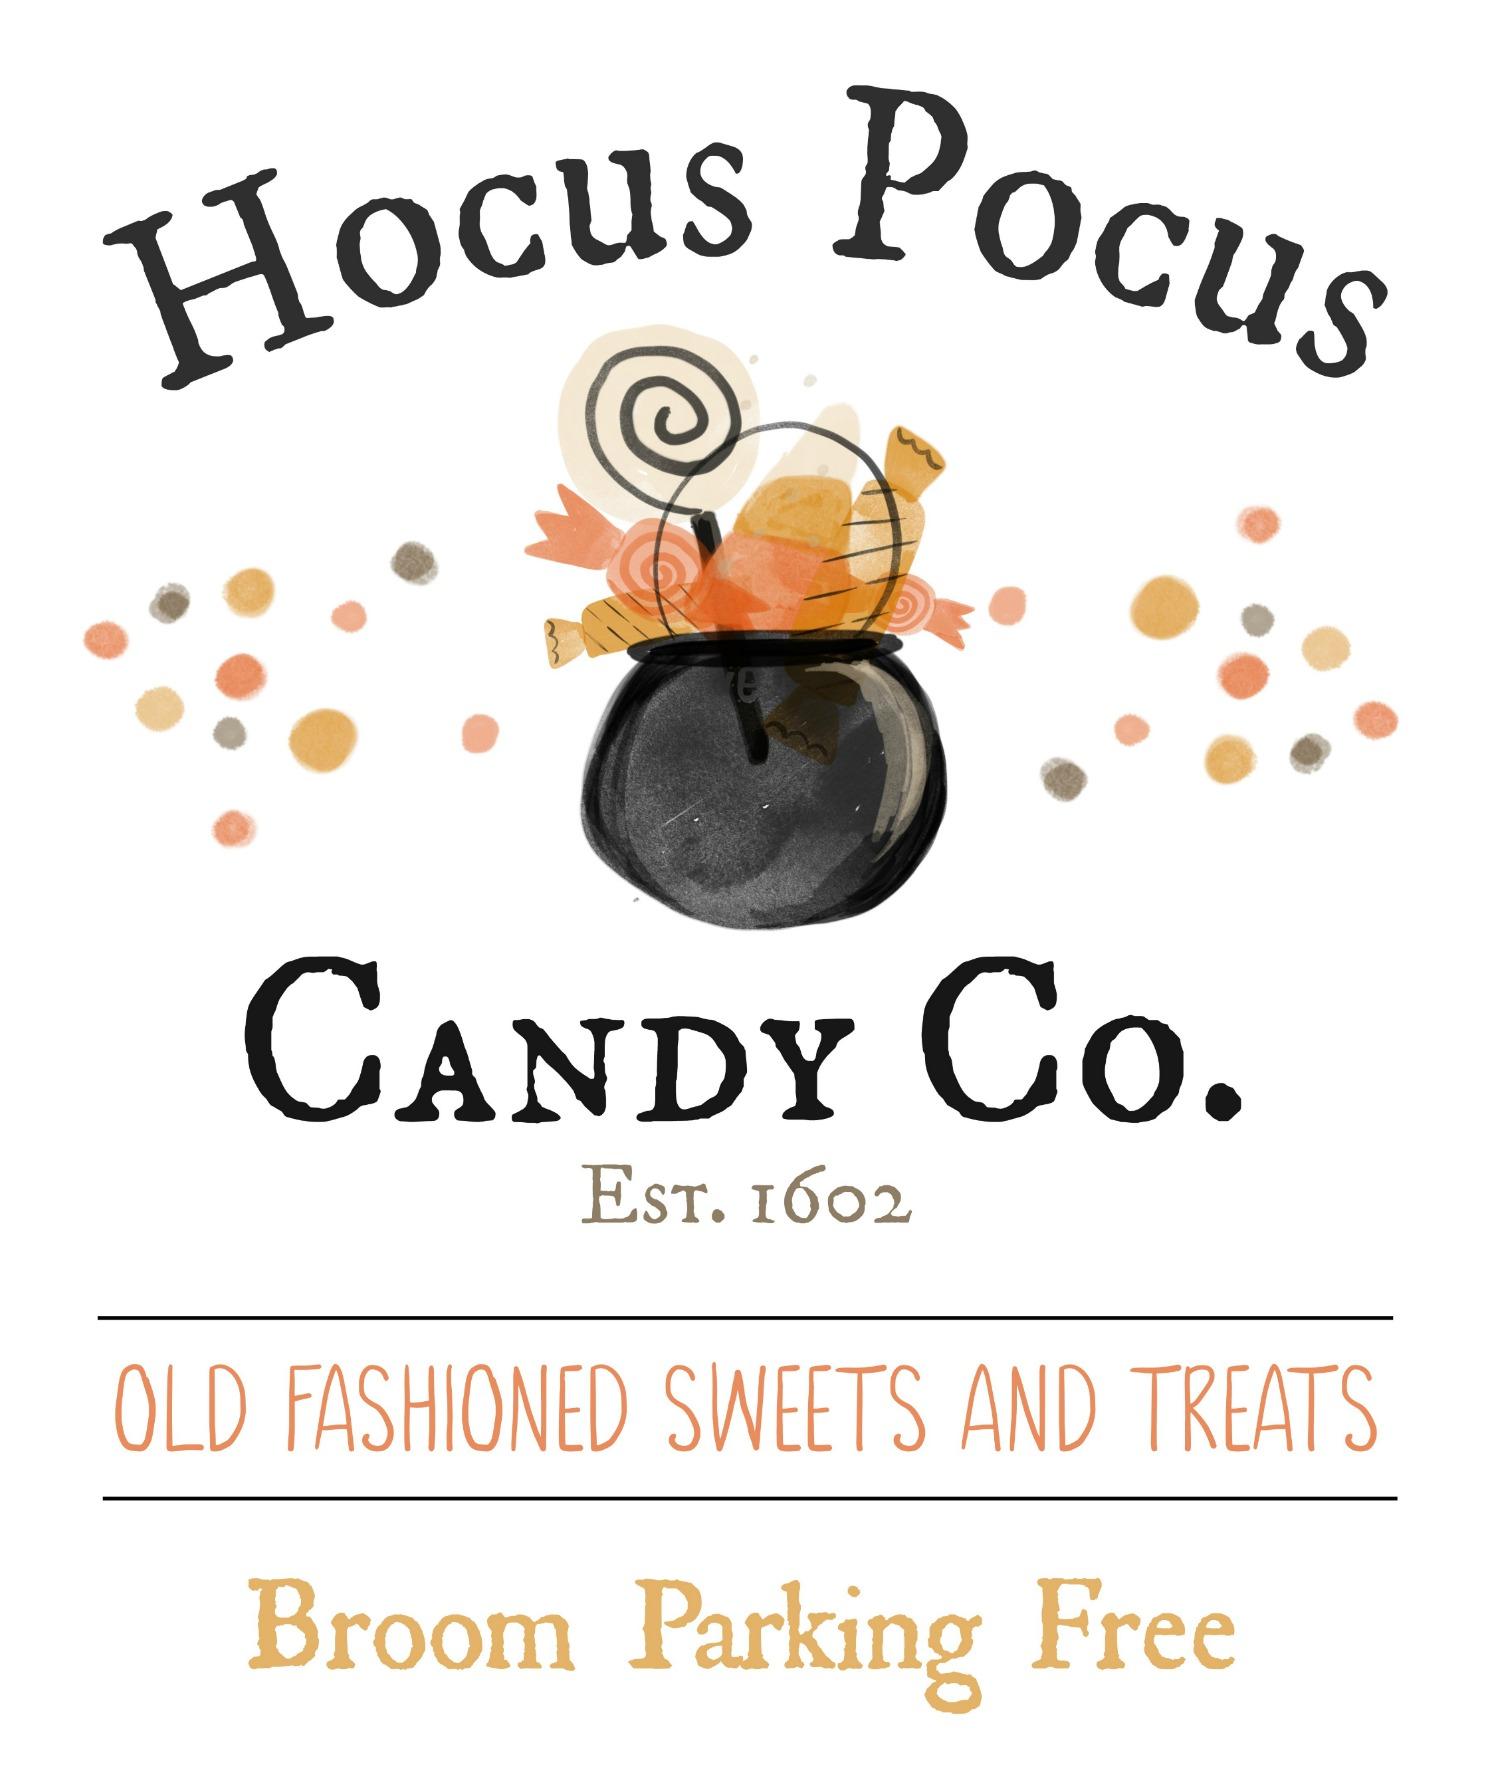 Hocus Pocus Candy Co. free Halloween printable.